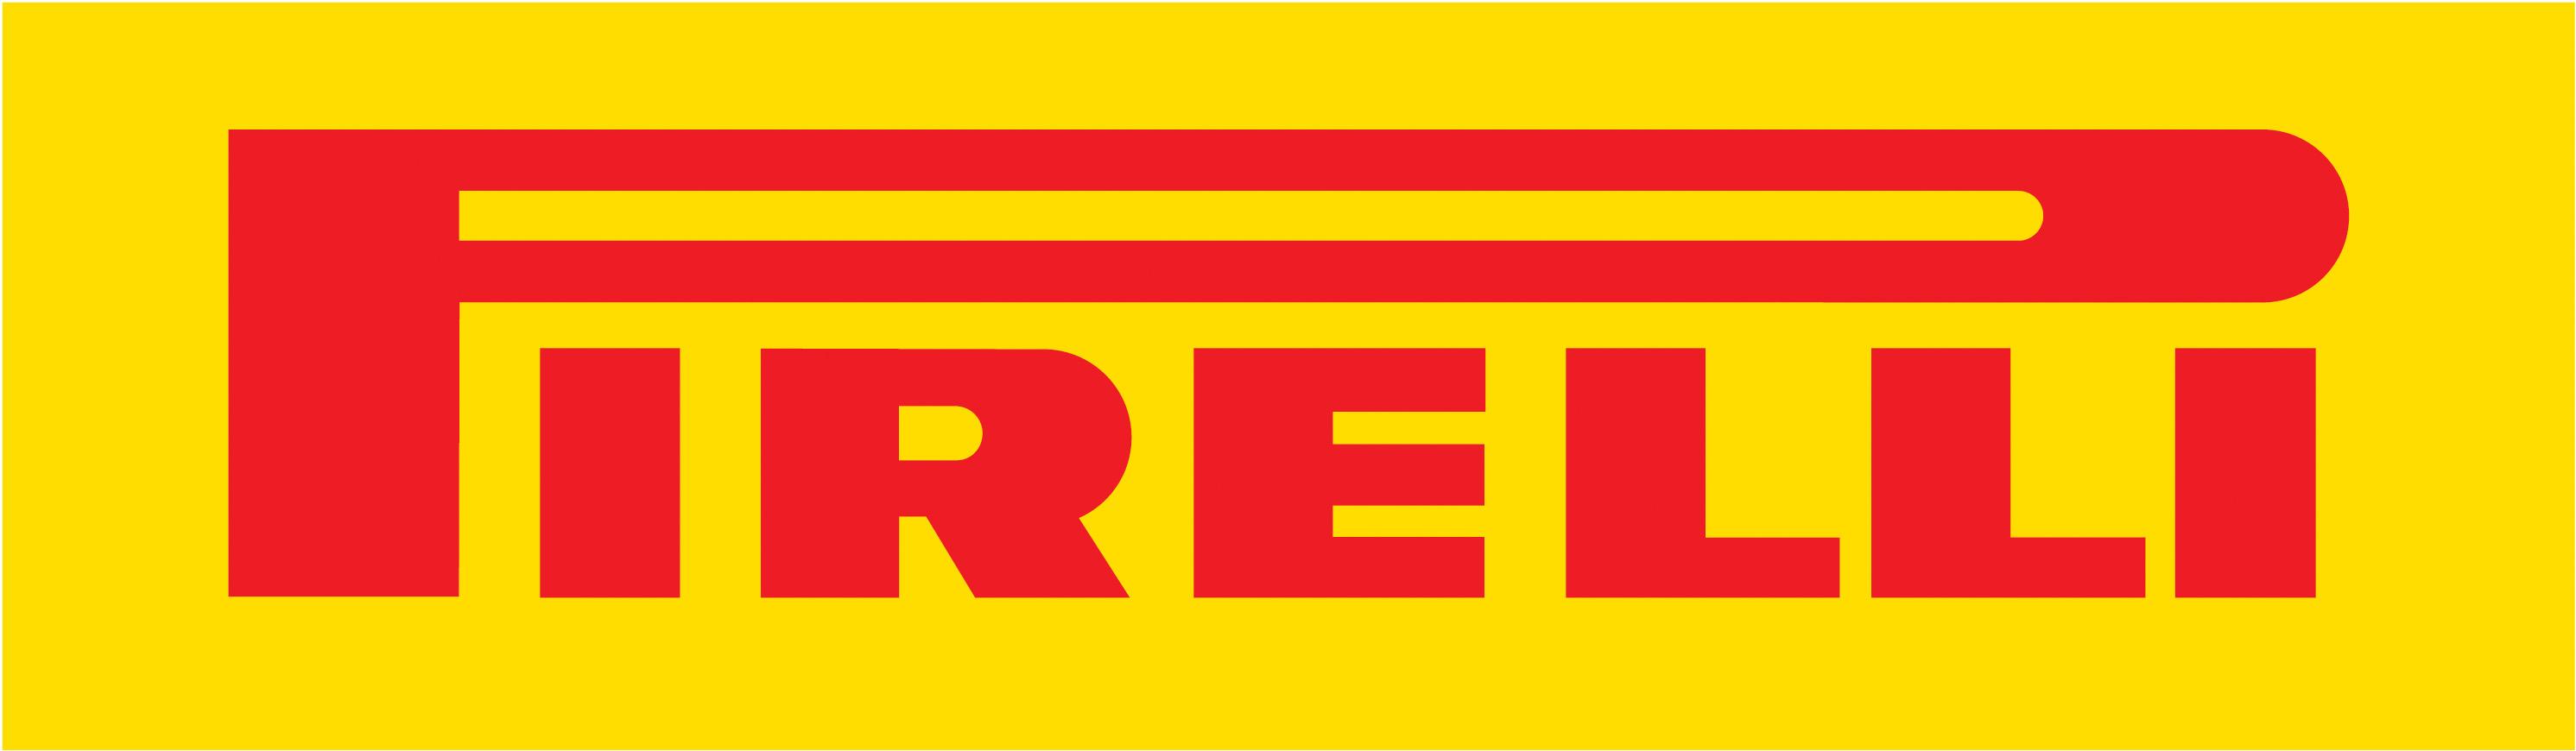 Pirelli_Logo2